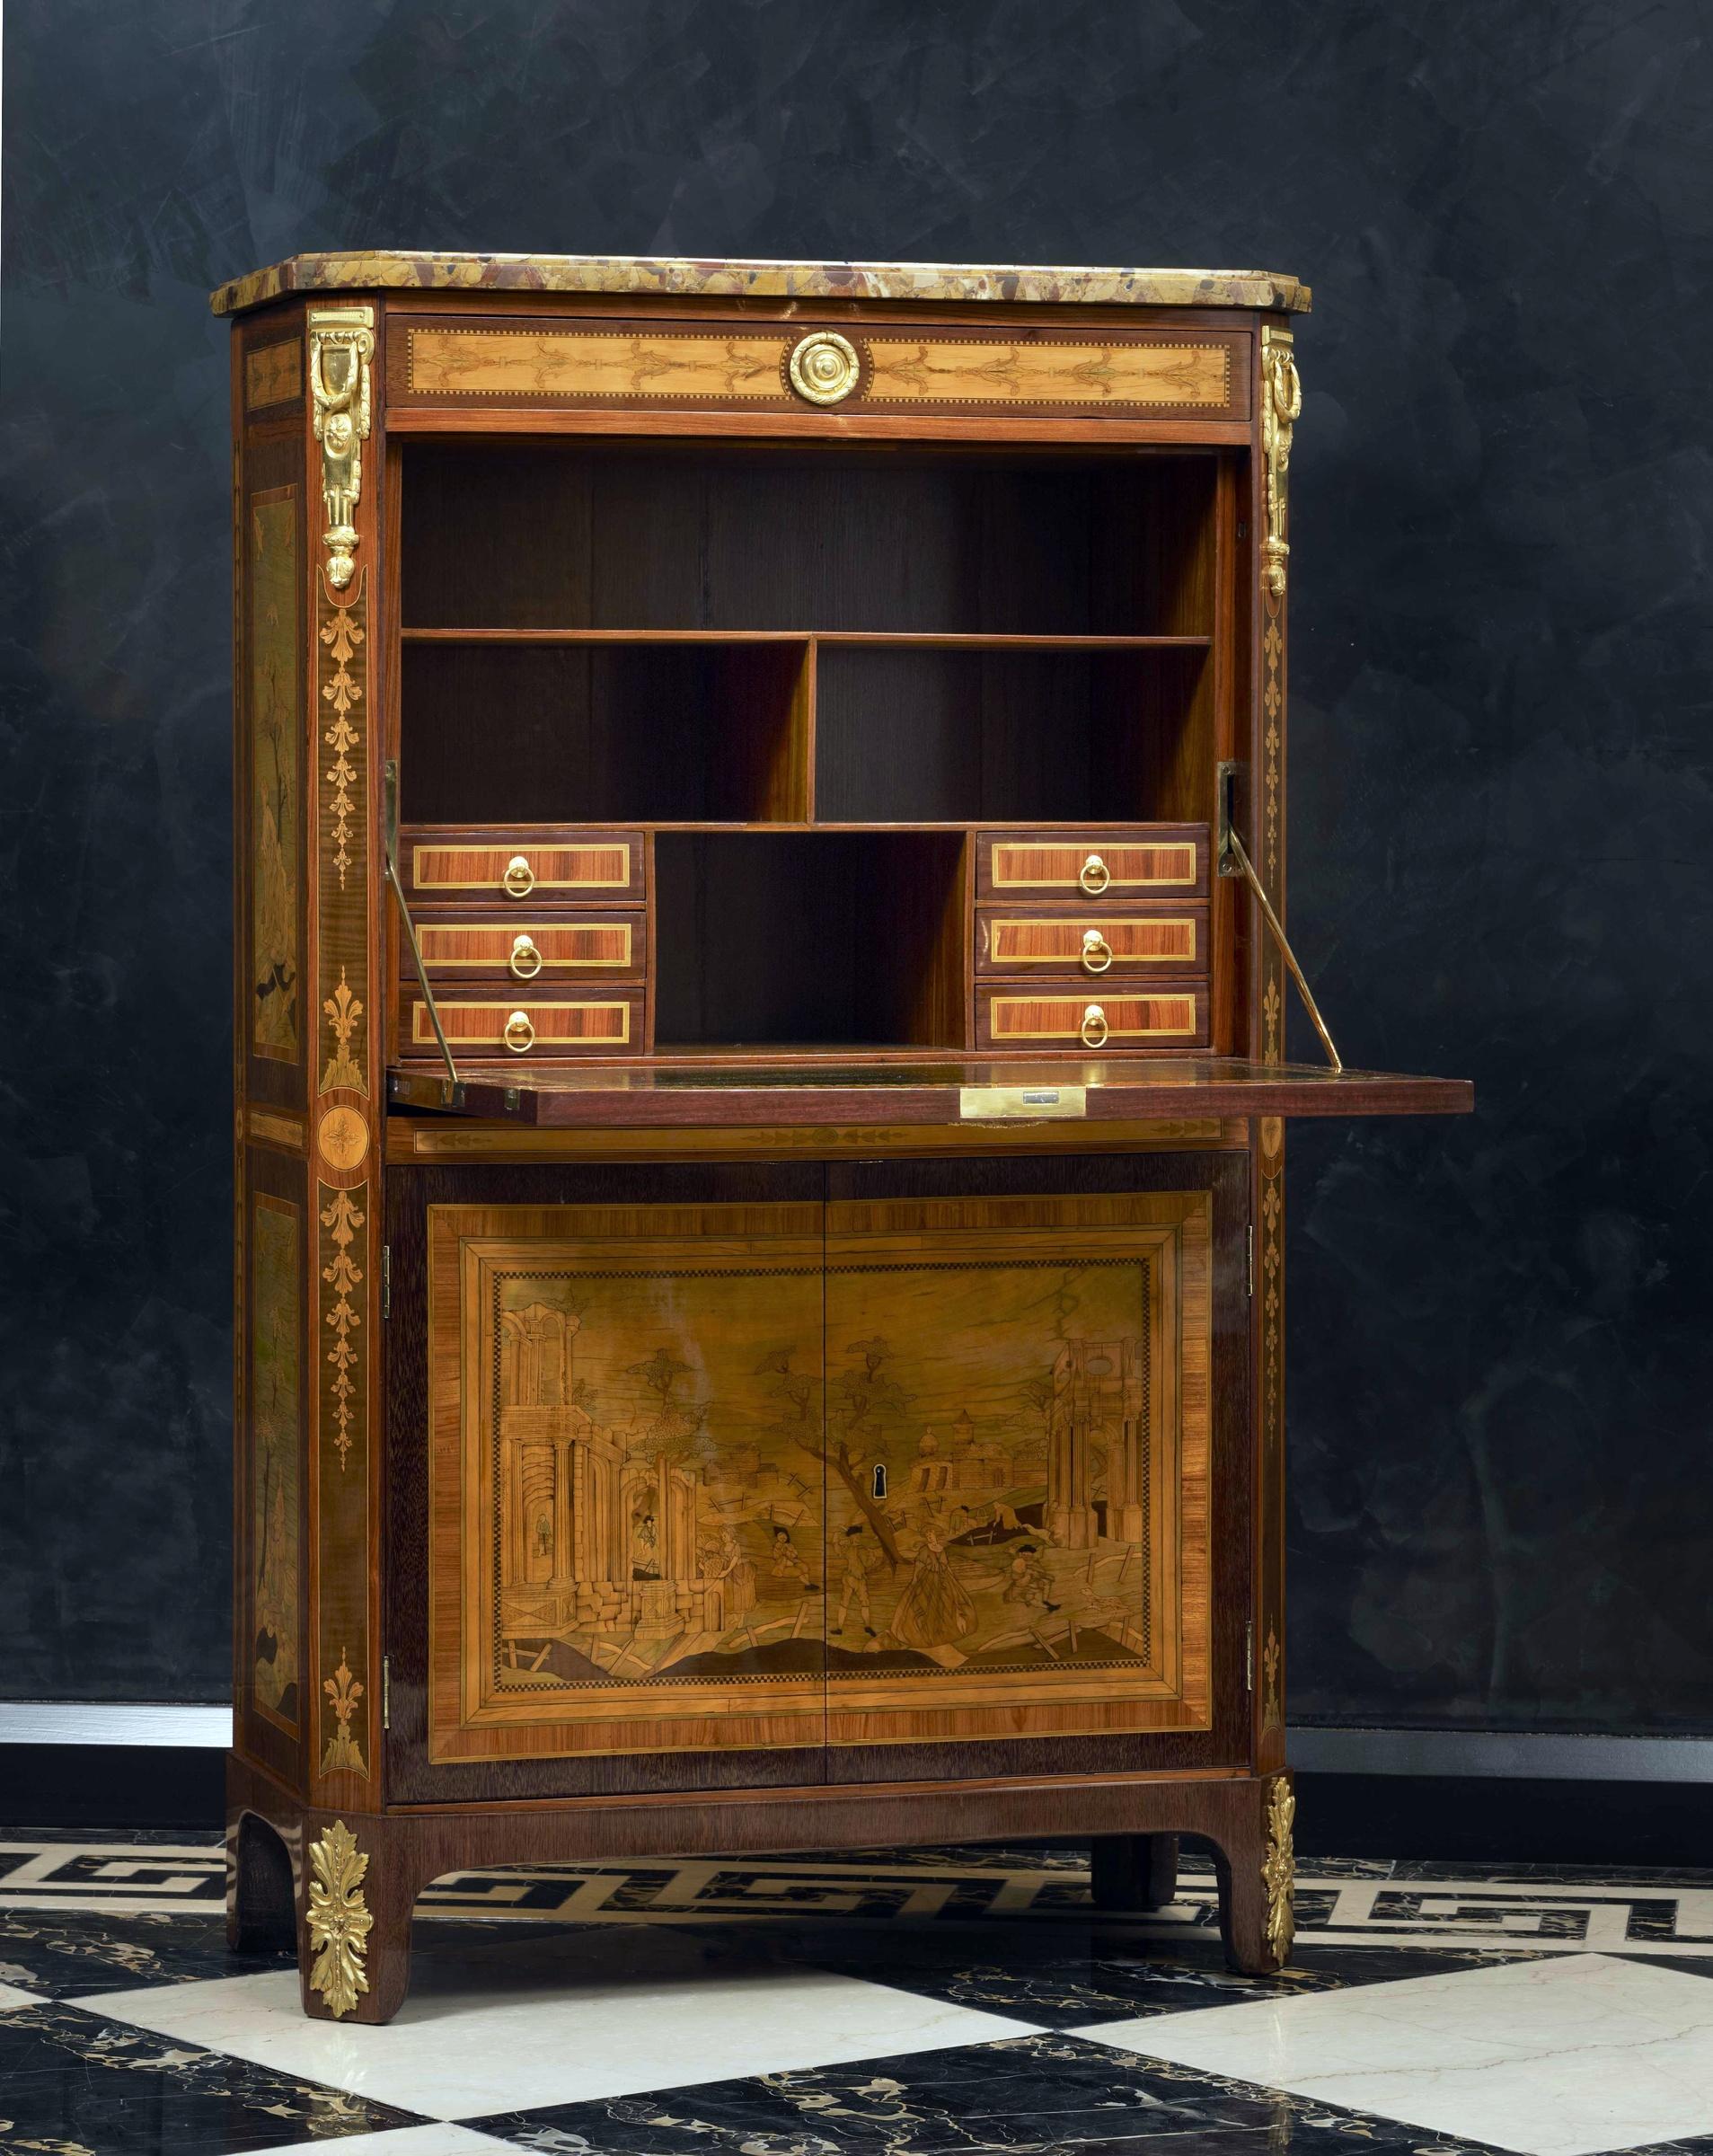 nicolas petit a louis xvi secr taire abattant by nicolas petit paris date crca 1775. Black Bedroom Furniture Sets. Home Design Ideas